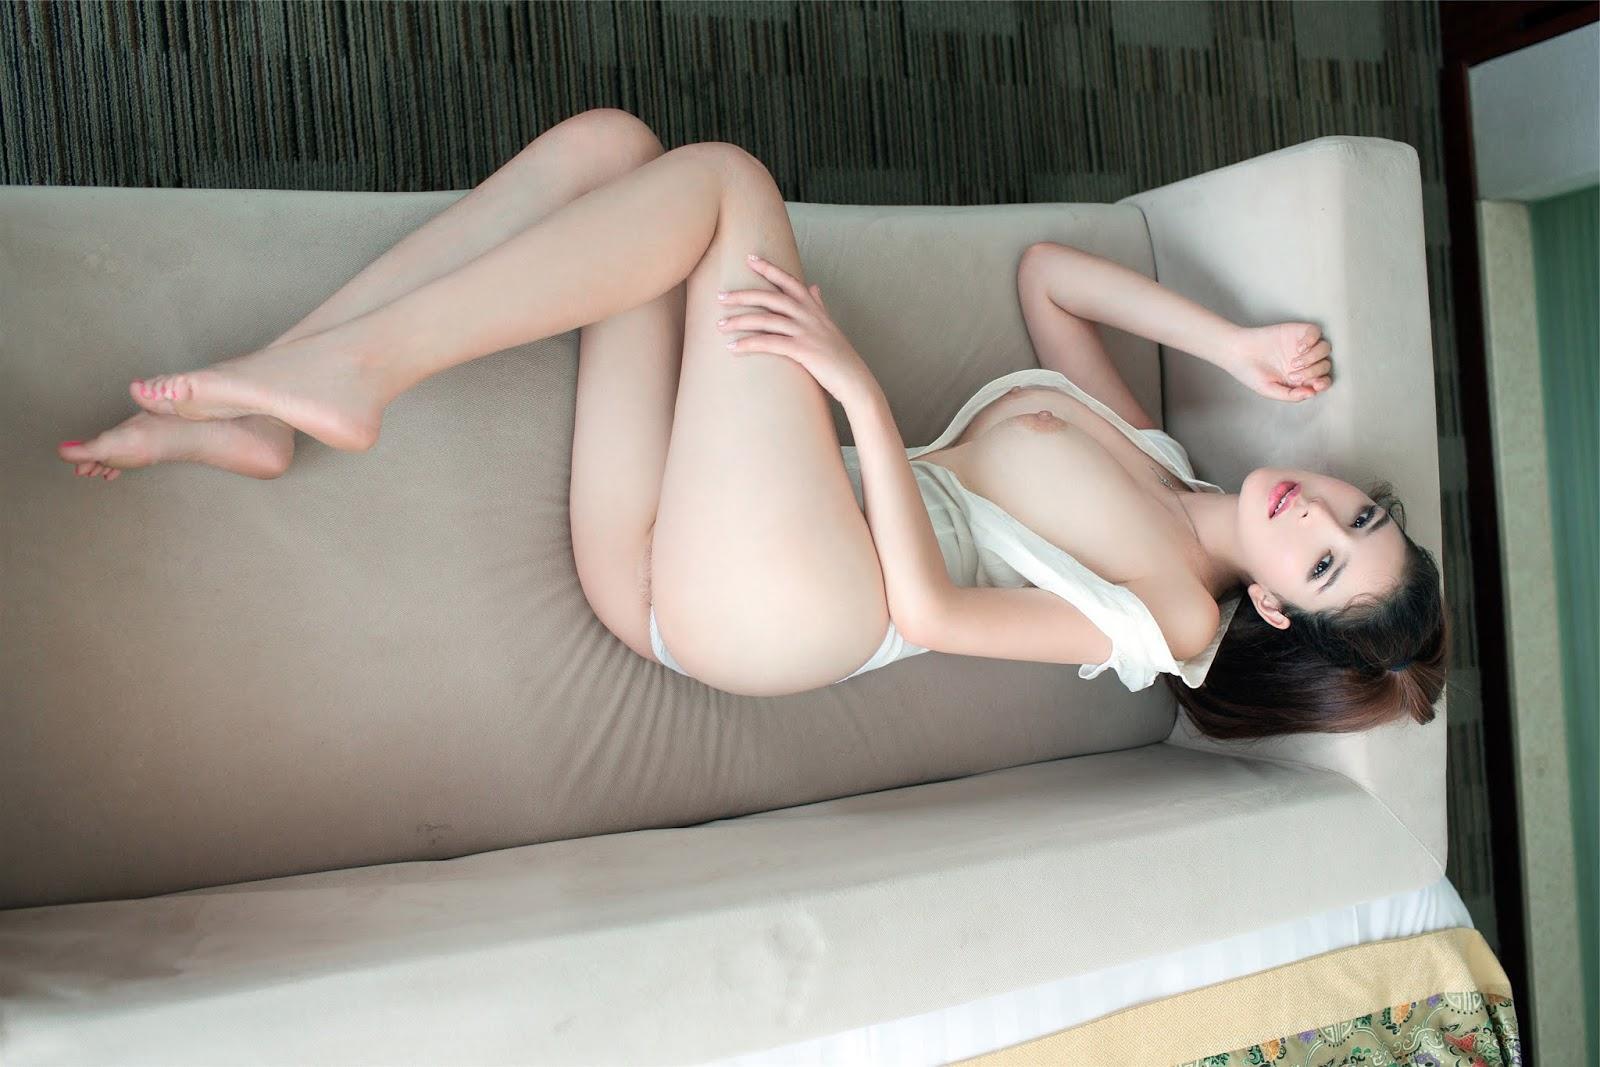 BoolWowGirls%2B%252814%2529 - Li LiSha 李丽莎 Beautiful Nude Model